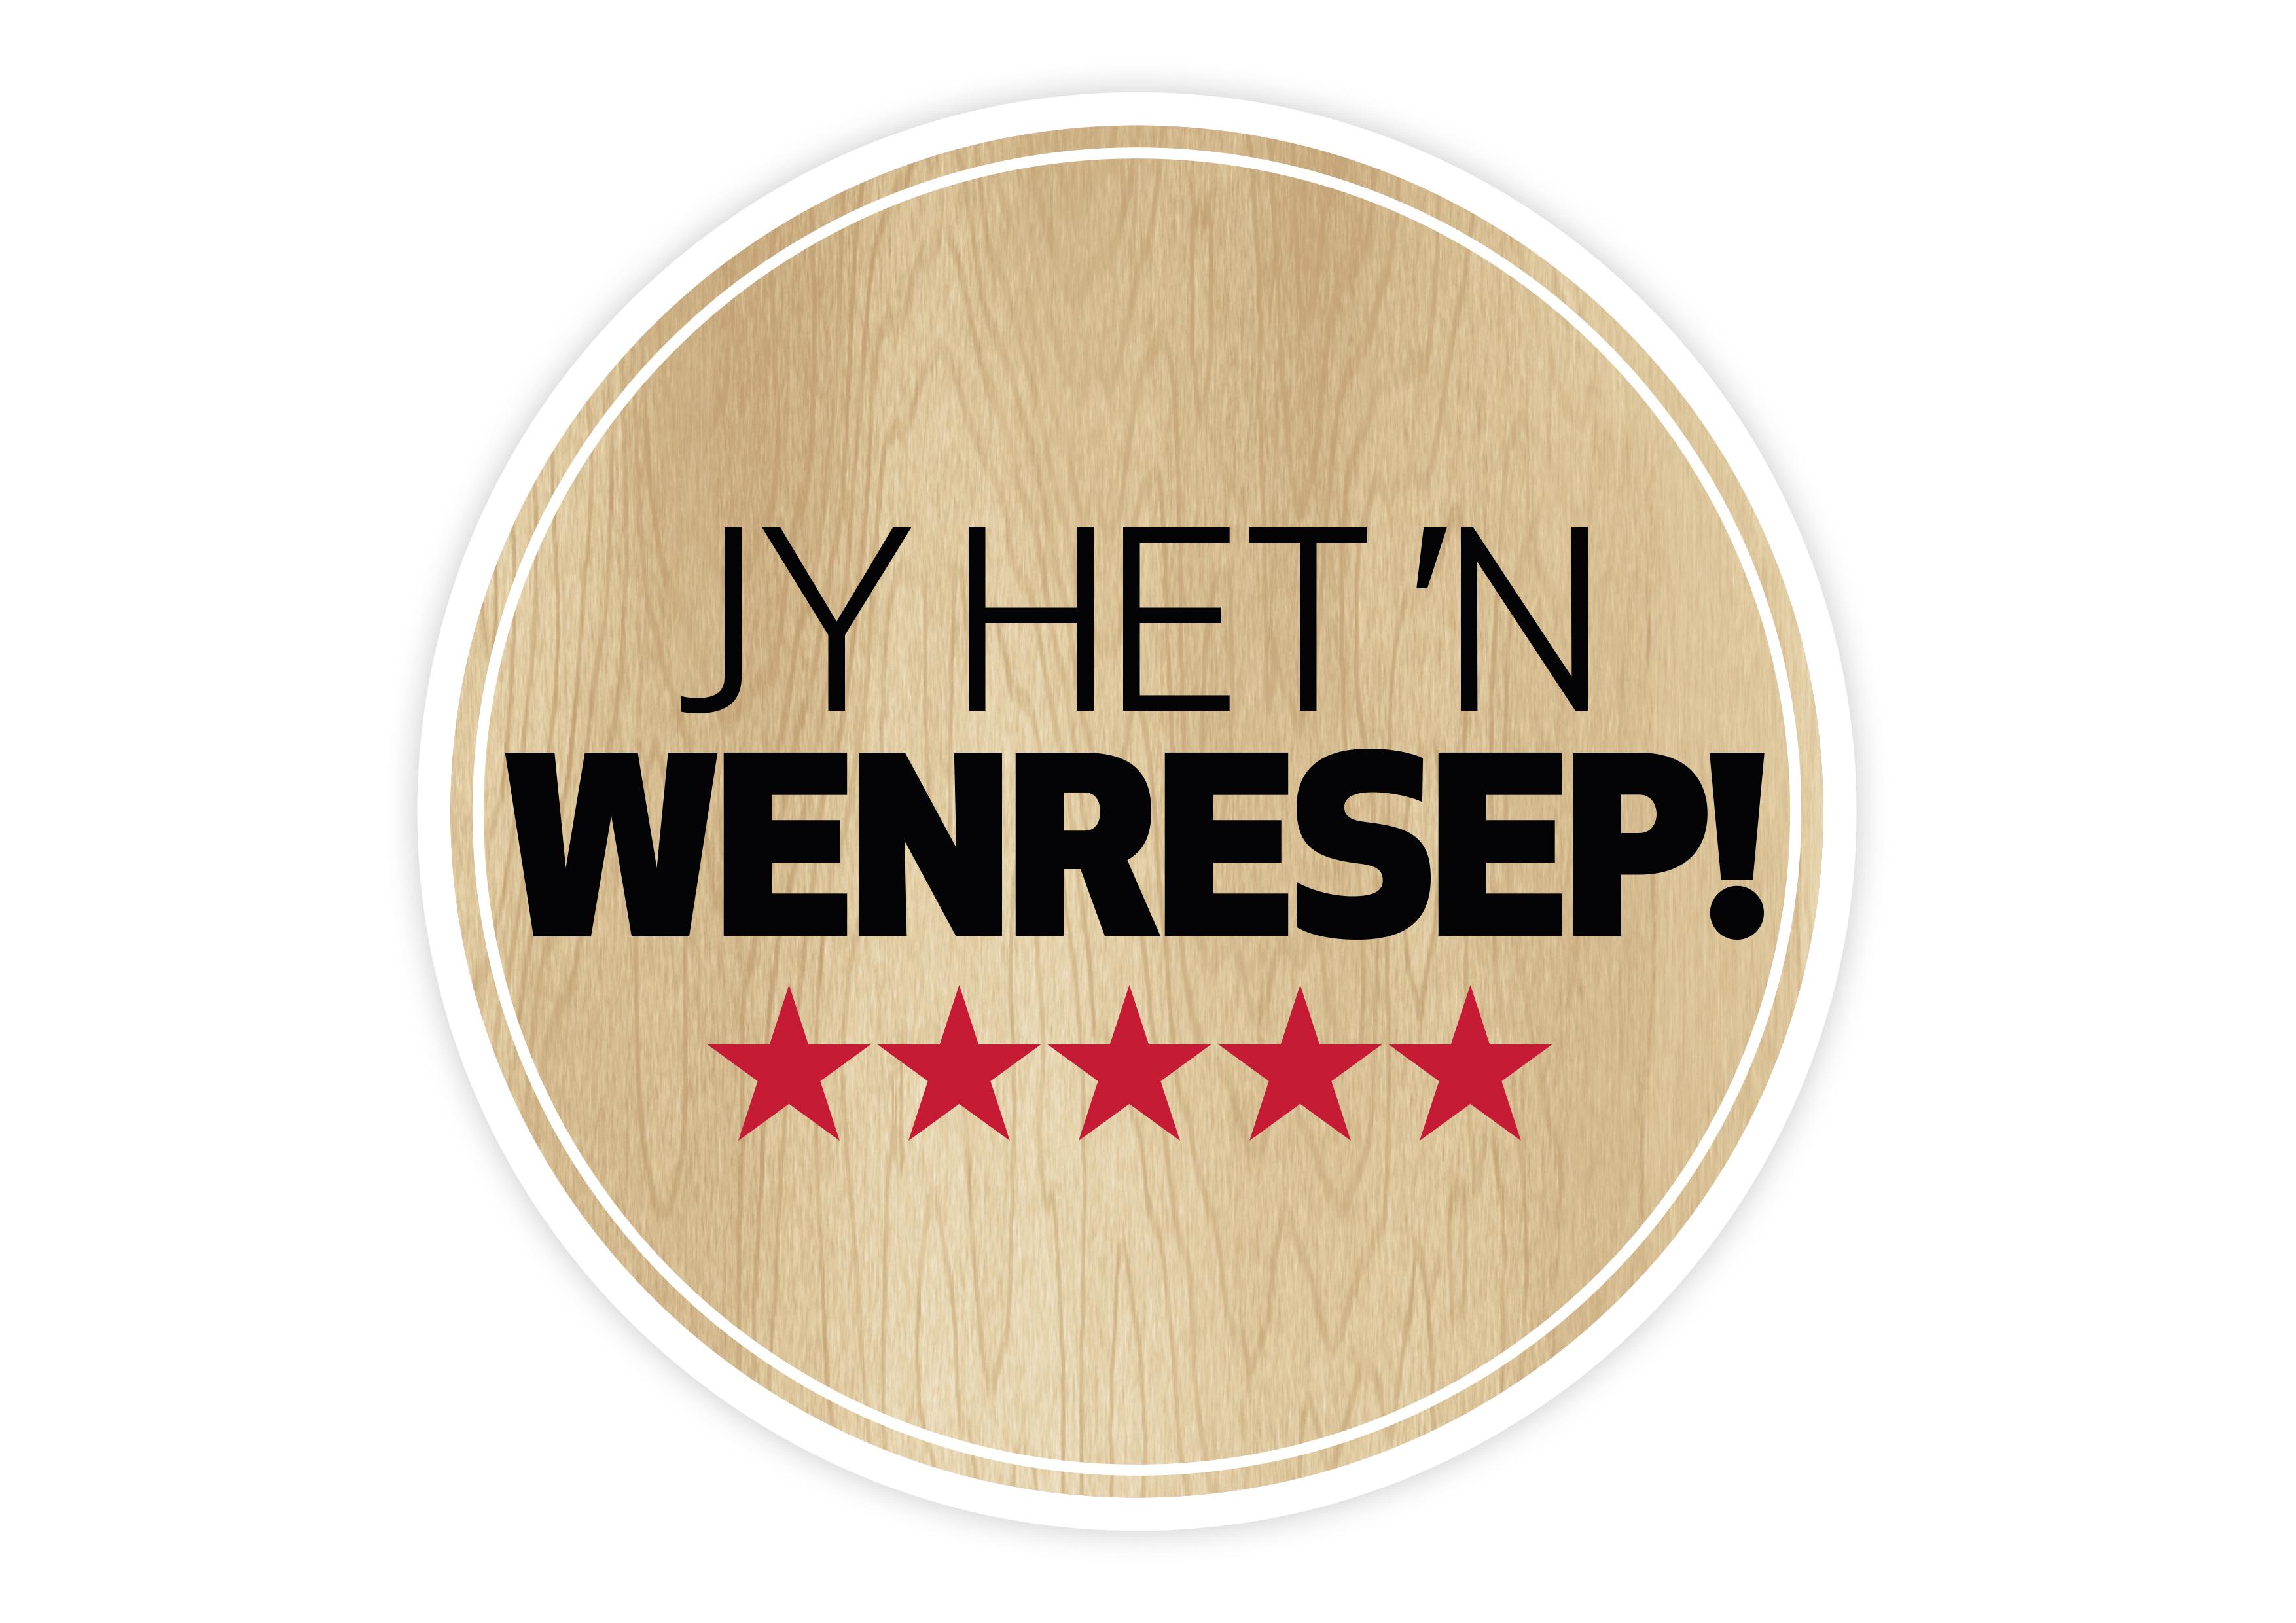 wenresep-logo-high-res